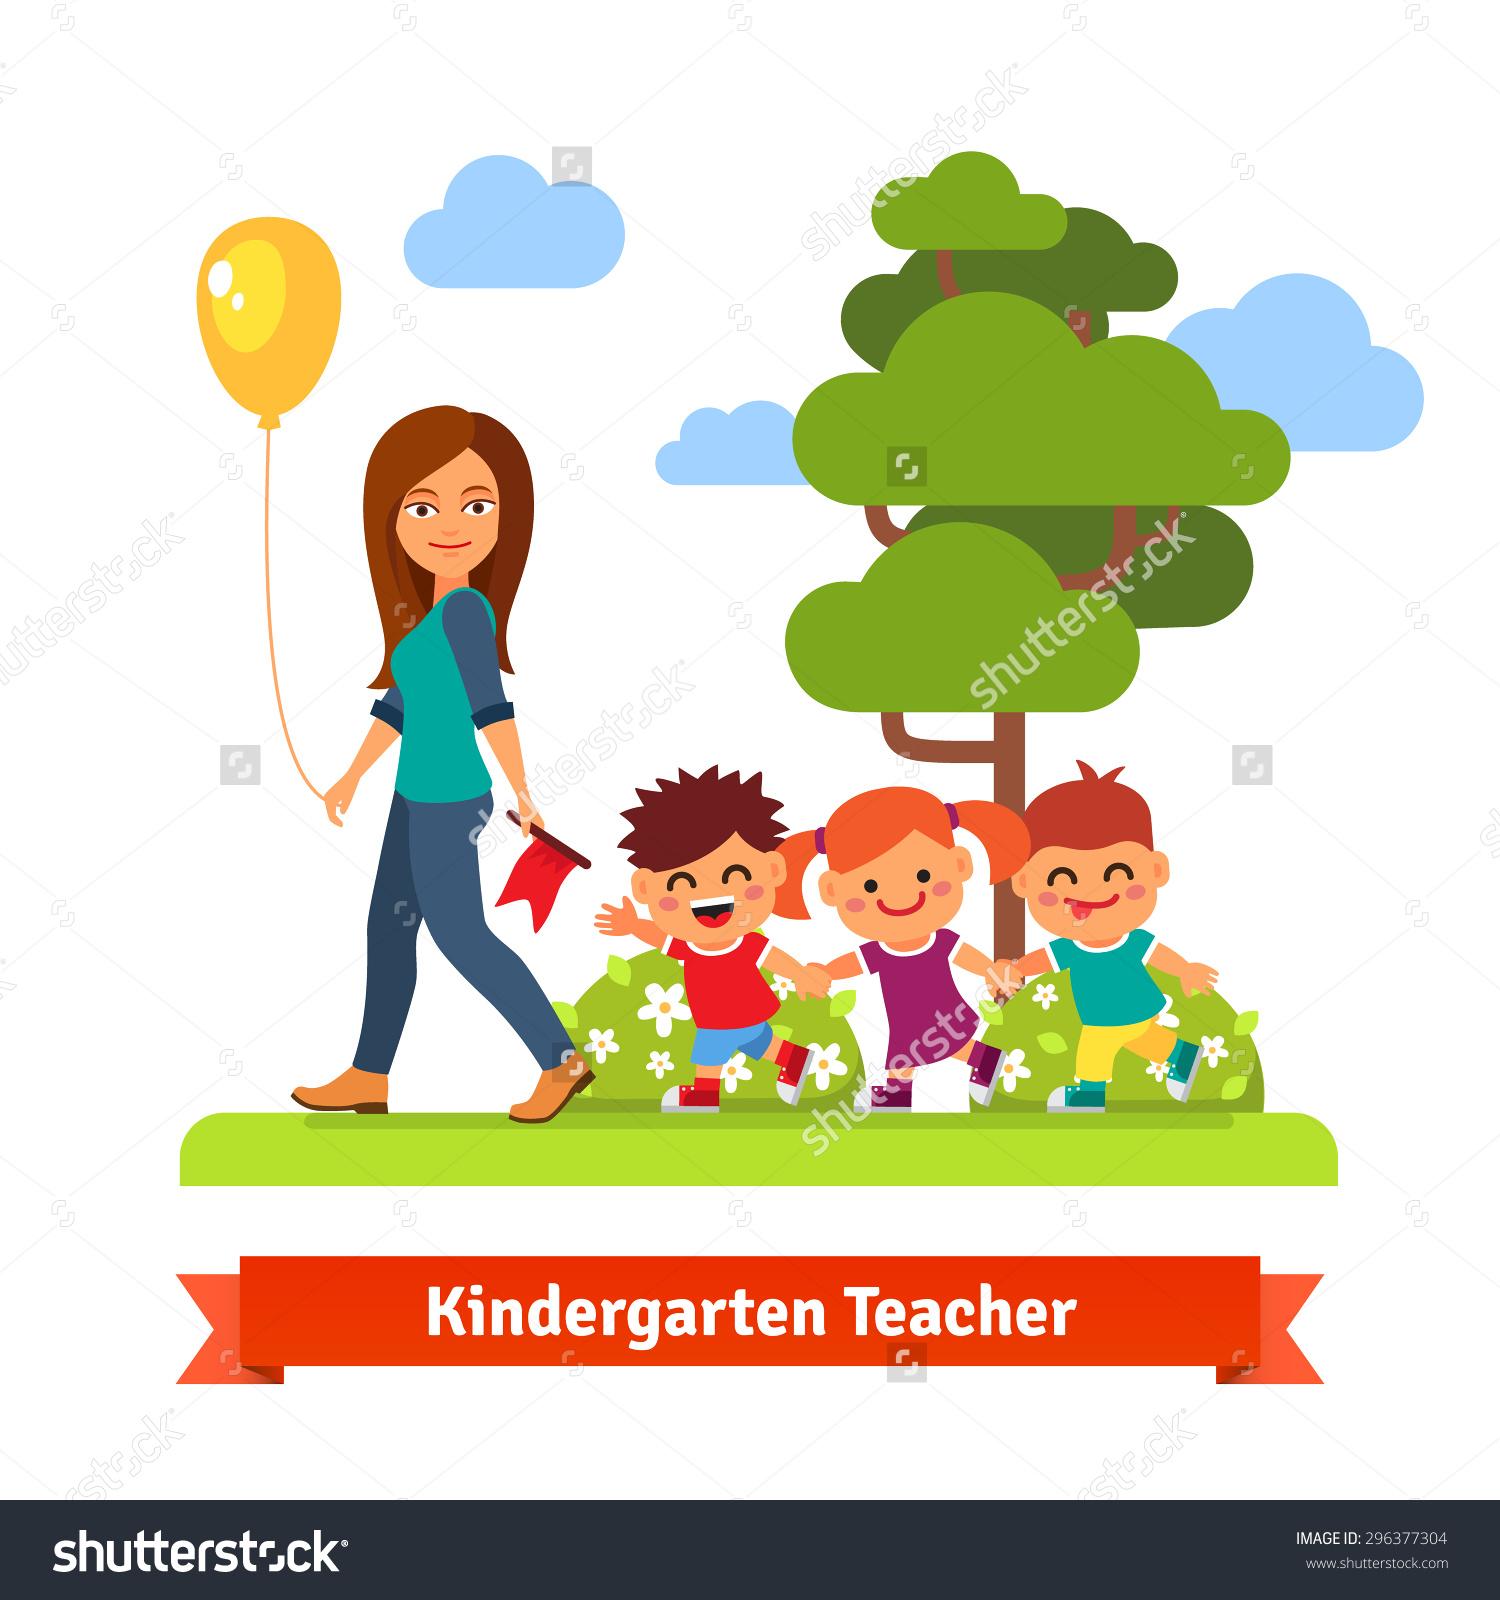 Kindergarten teacher clipart picture freeuse stock Young Kindergarten Teacher Walking Park Kids Stock Vector ... picture freeuse stock